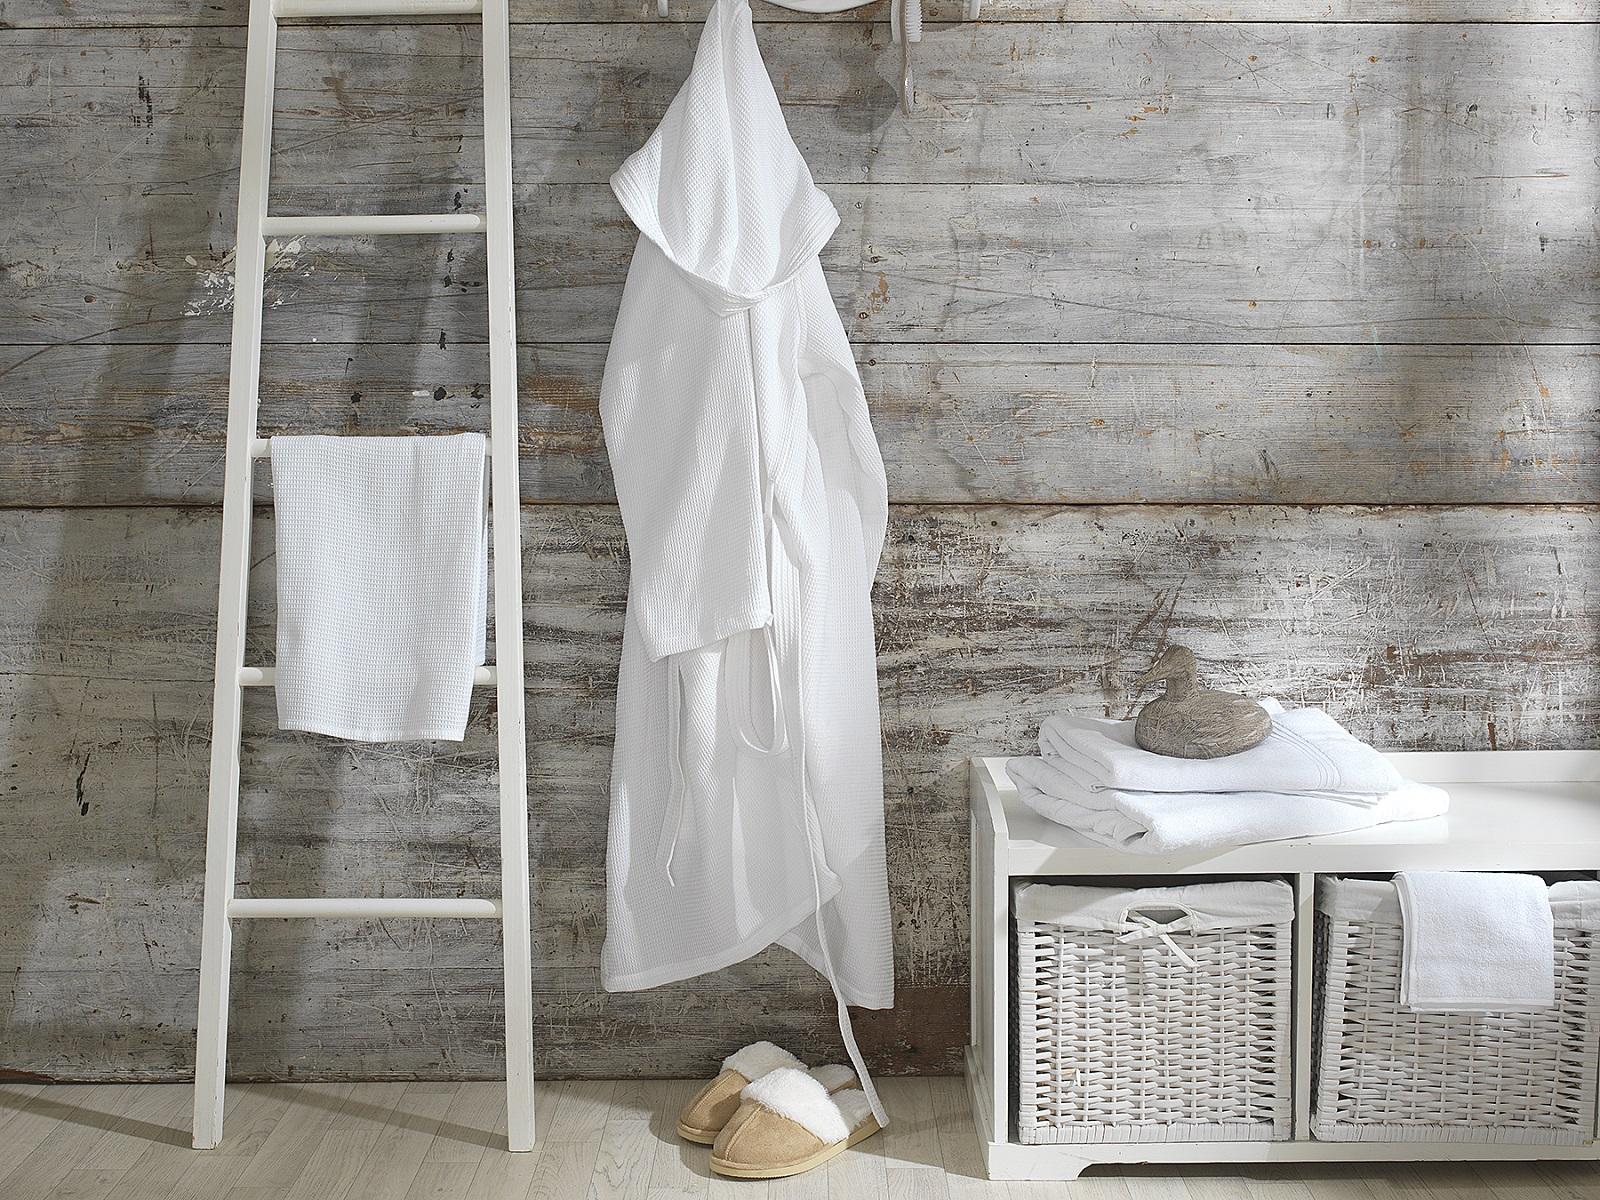 Prestige Collection - Lightweight Unisex Bath Robe with Hood